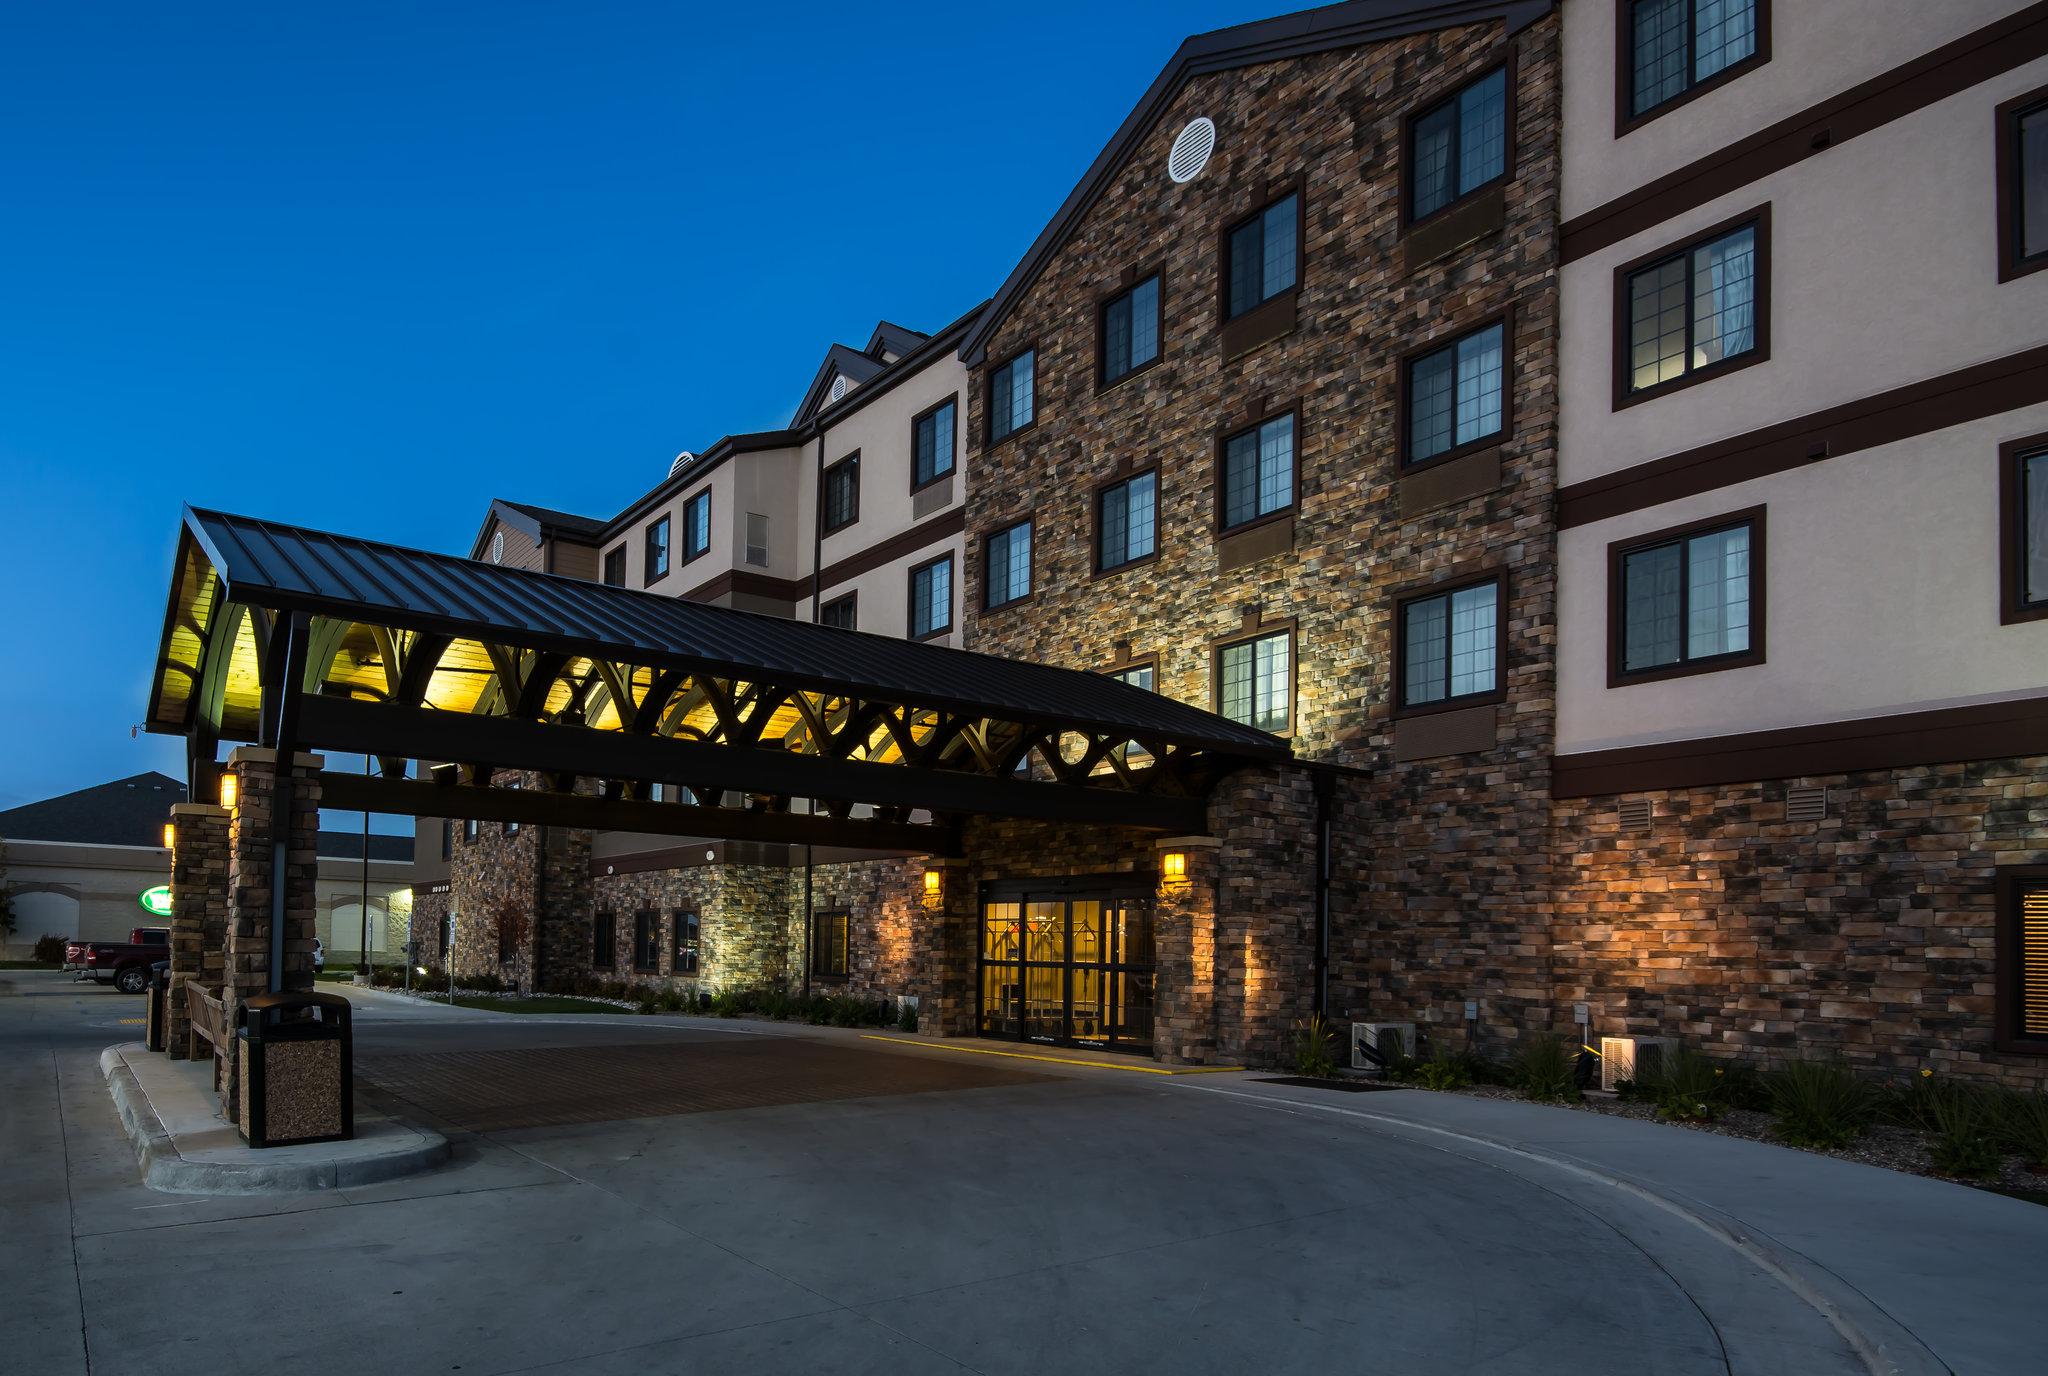 Staybridge Suites Grand Forks Nd Hotels Tourist Class Hotels In Grand Forks Gds Reservation